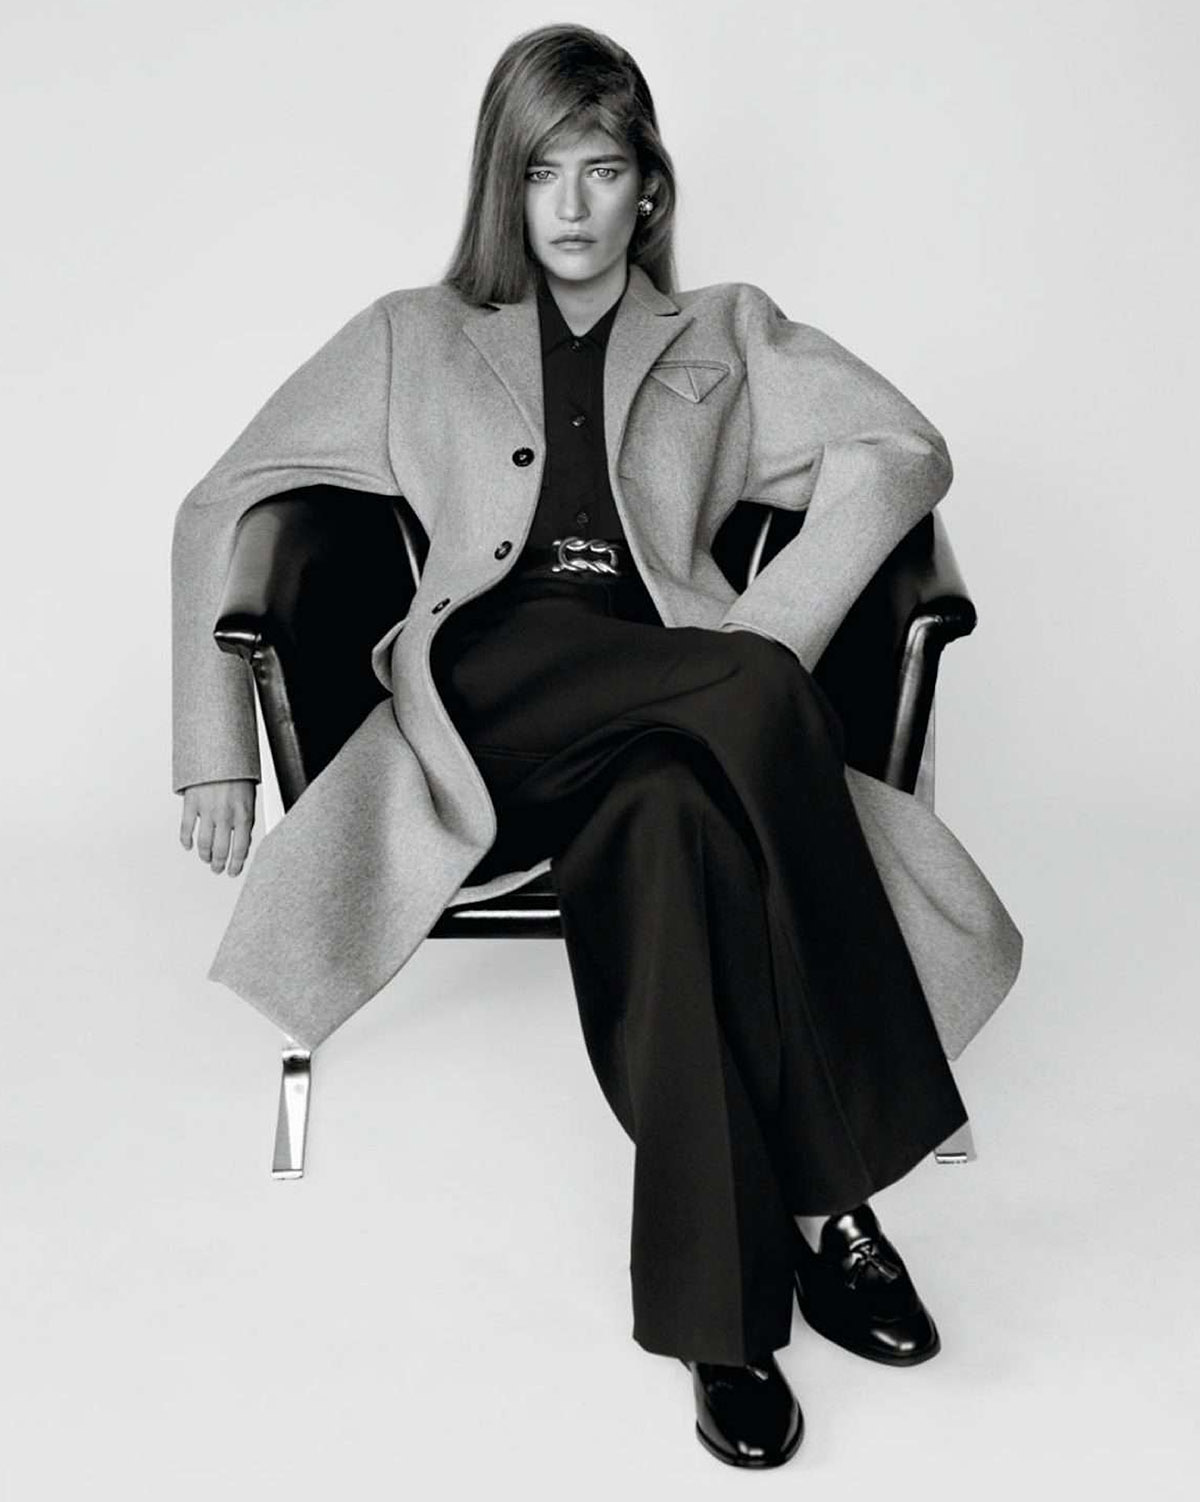 Mariam de Vinzelle and Lola Nicon by Alasdair McLellan for Vogue Paris February 2021